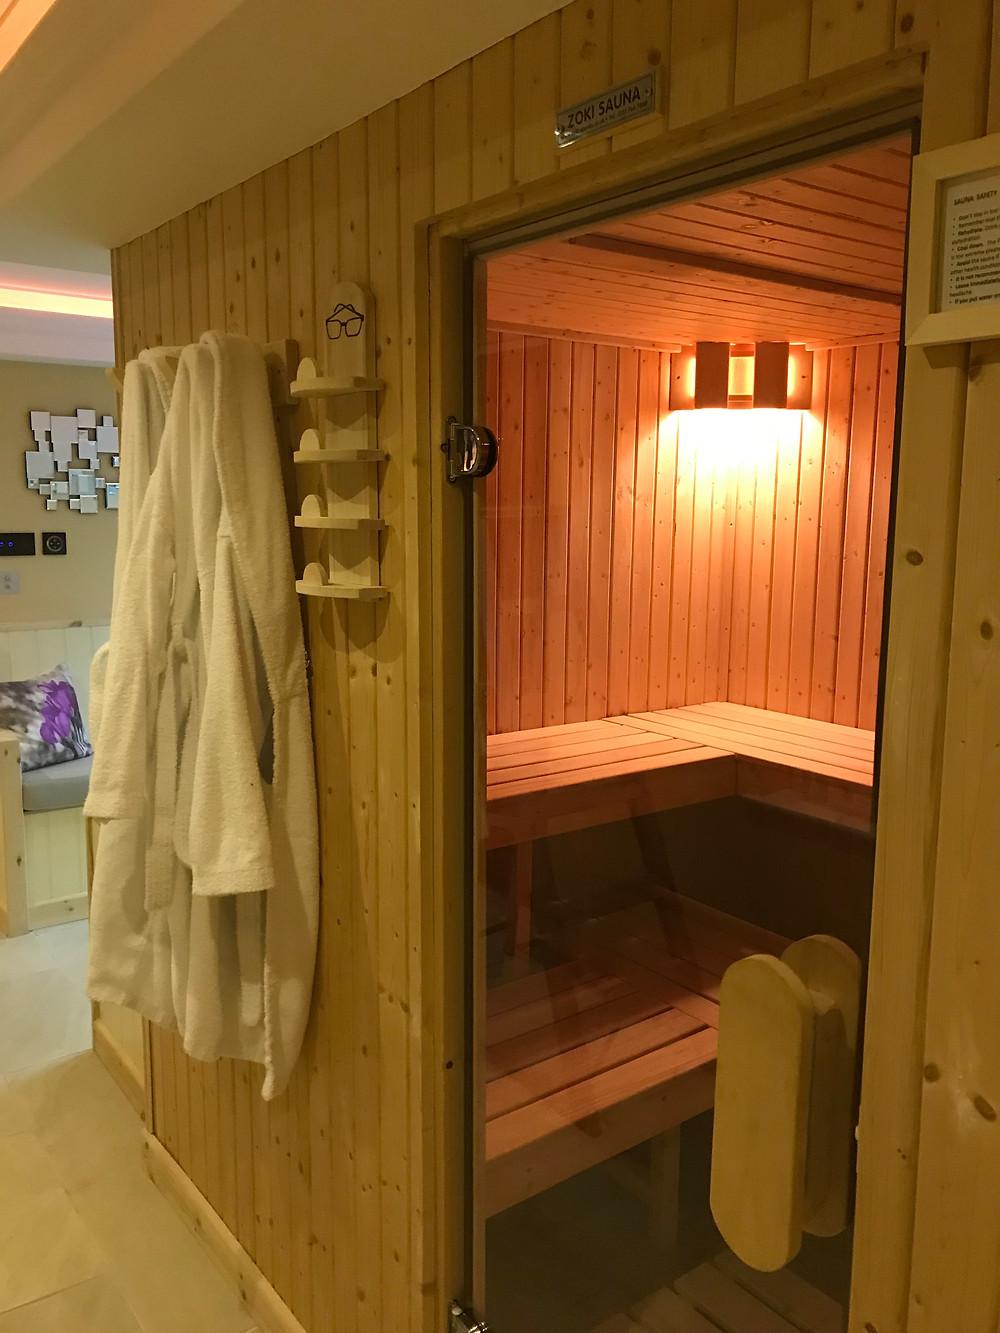 sauna at Sandpiper, thermal spa, how to enjoy a thermal spa